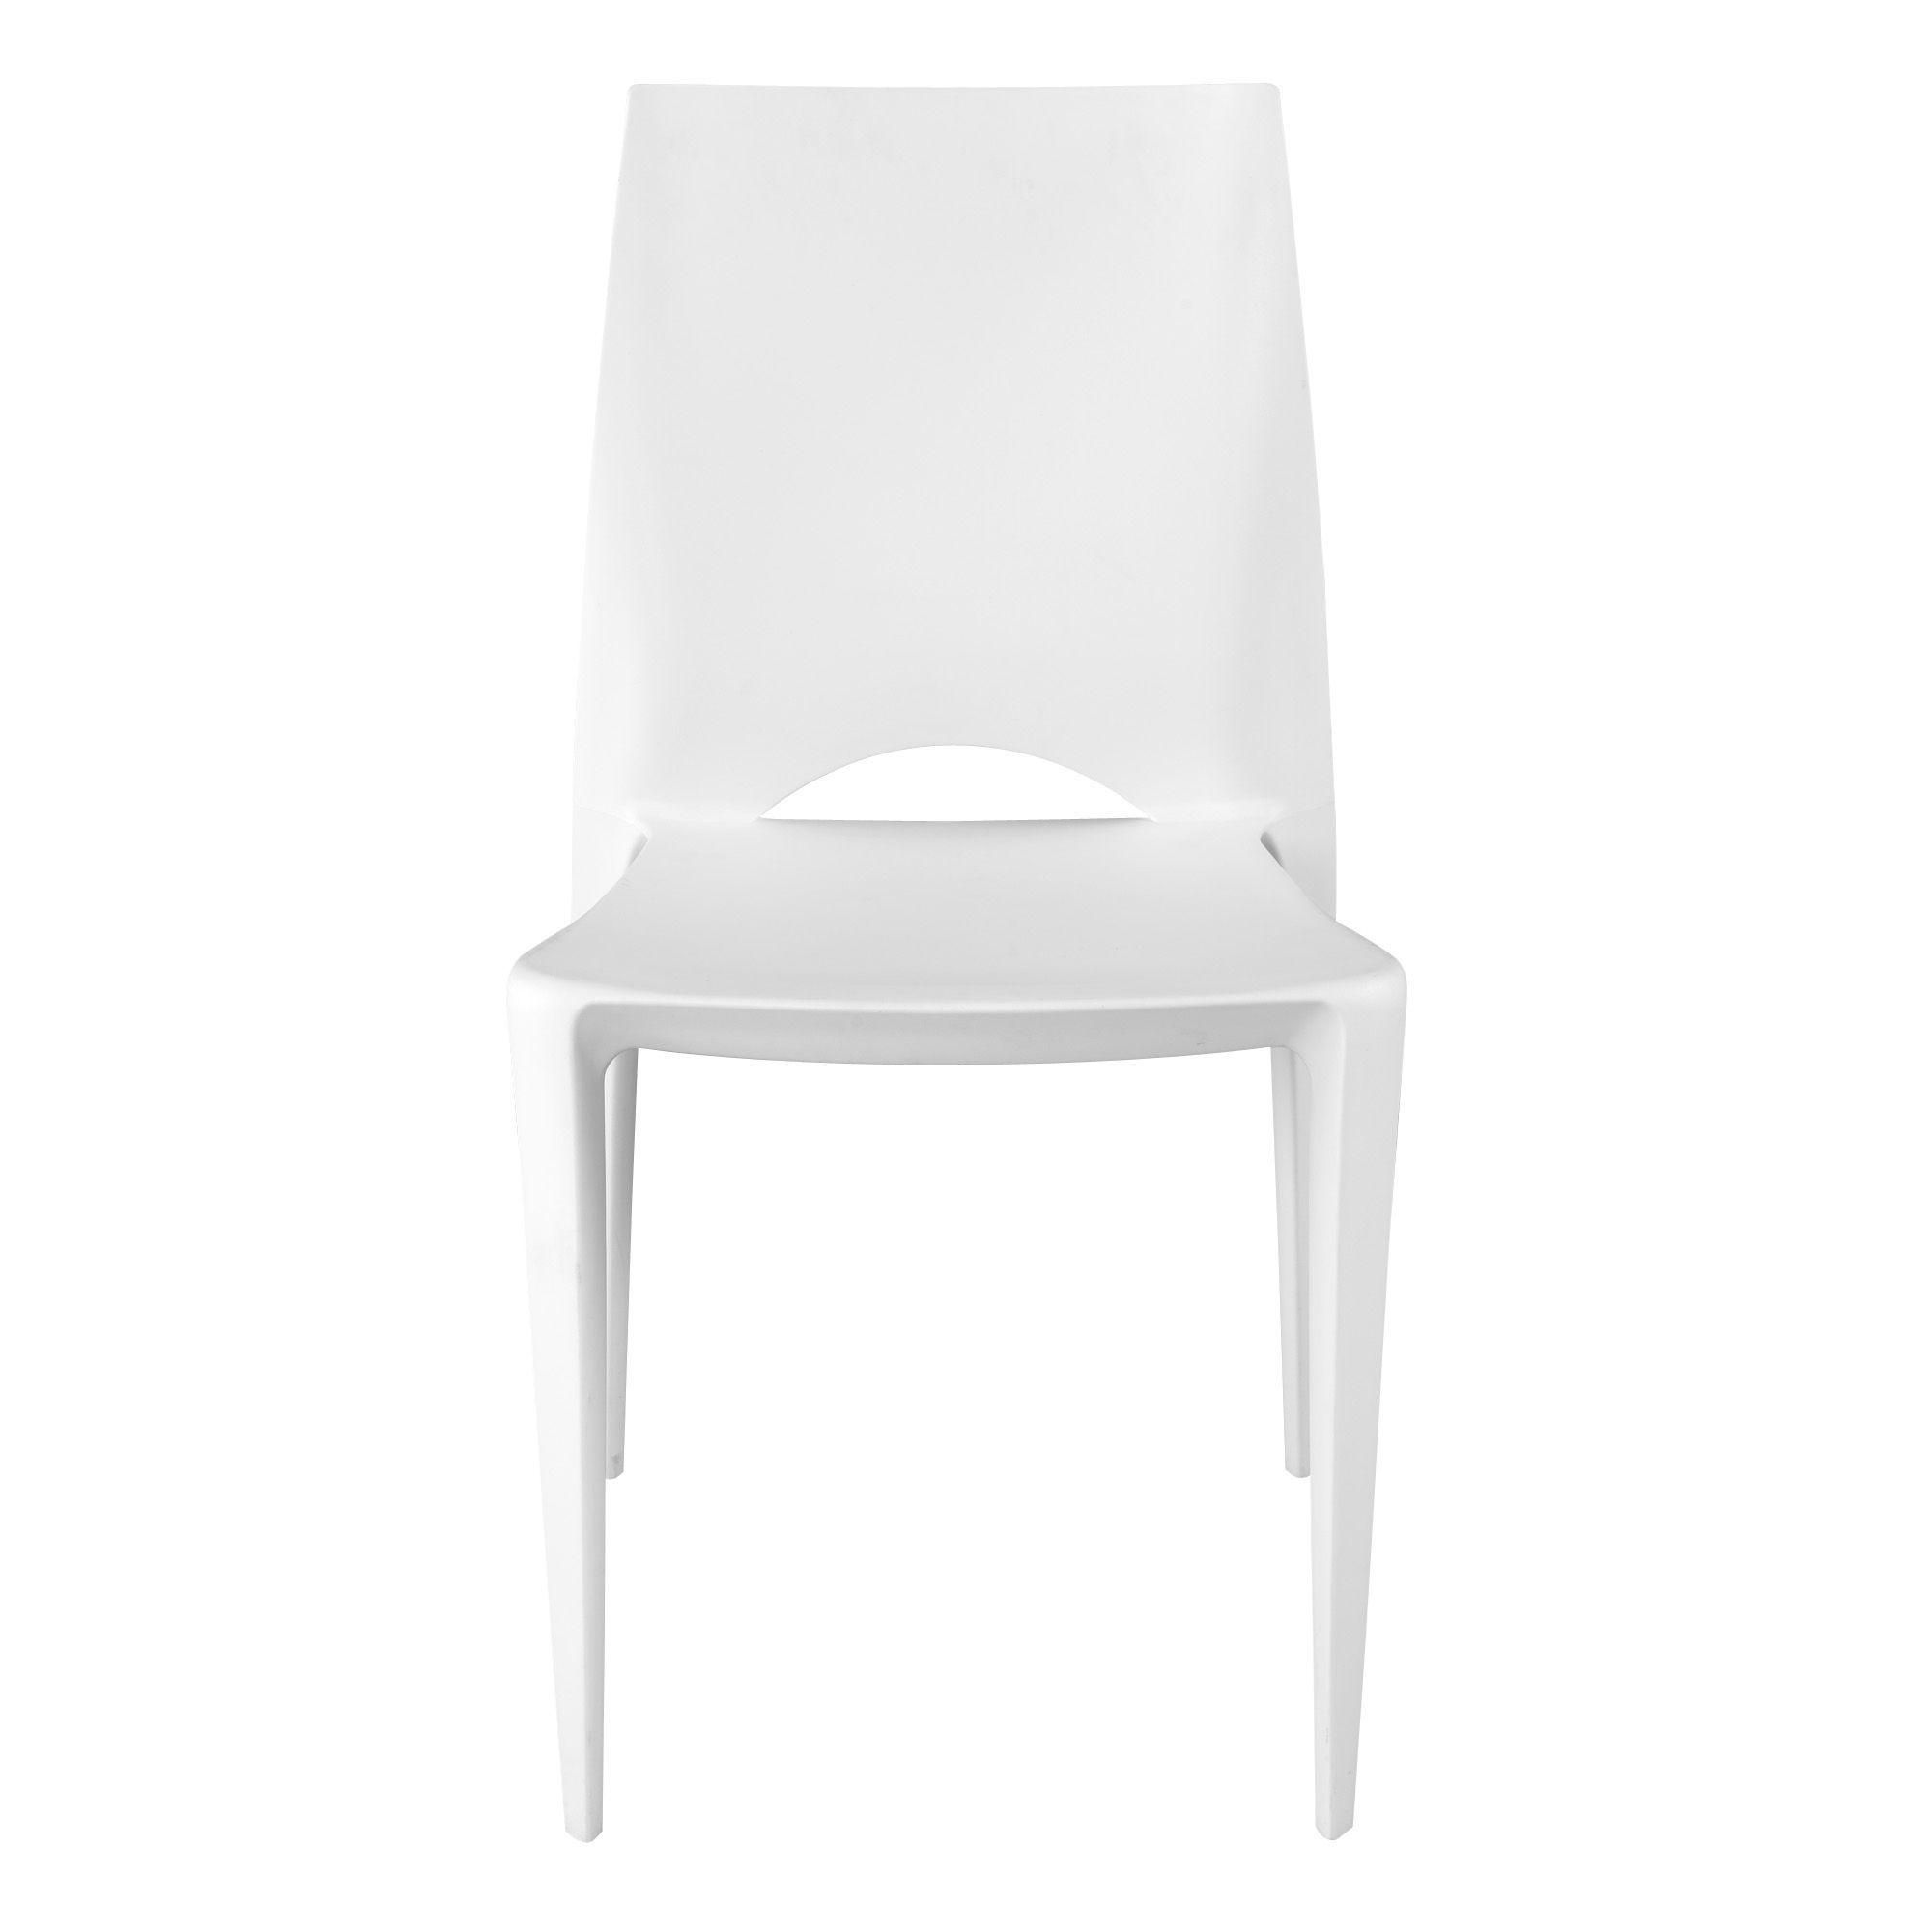 cool chaise moule blanche blanc kiwi chaise les chaises chaises et tabourets consoles with. Black Bedroom Furniture Sets. Home Design Ideas